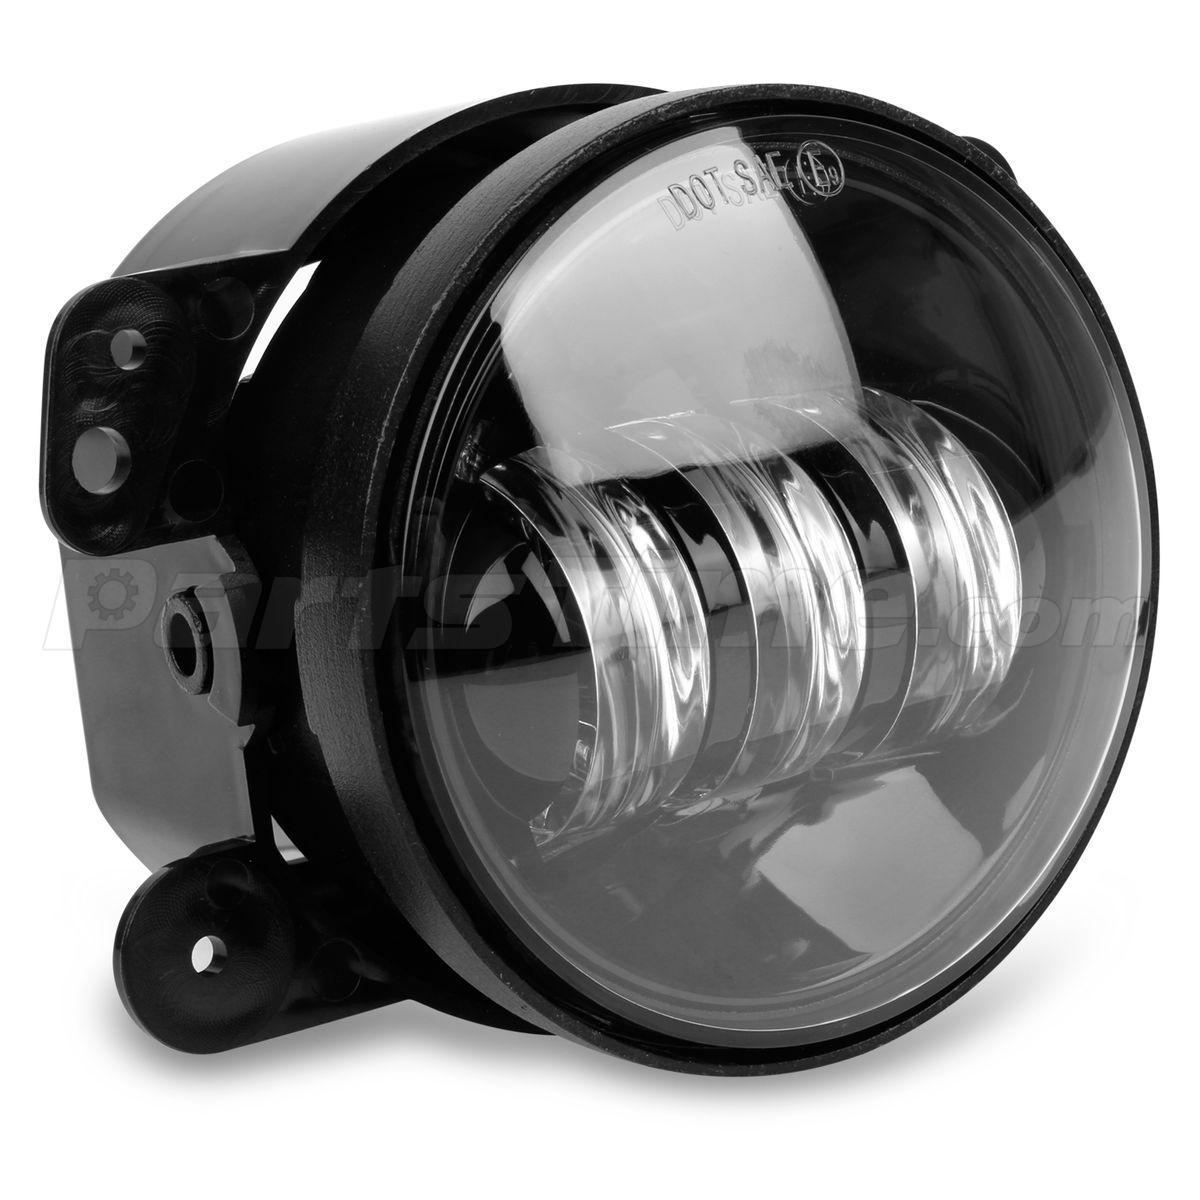 Kit led headlight 7 cree with 4 fog passing black light Jeep wrangler interior led light kit